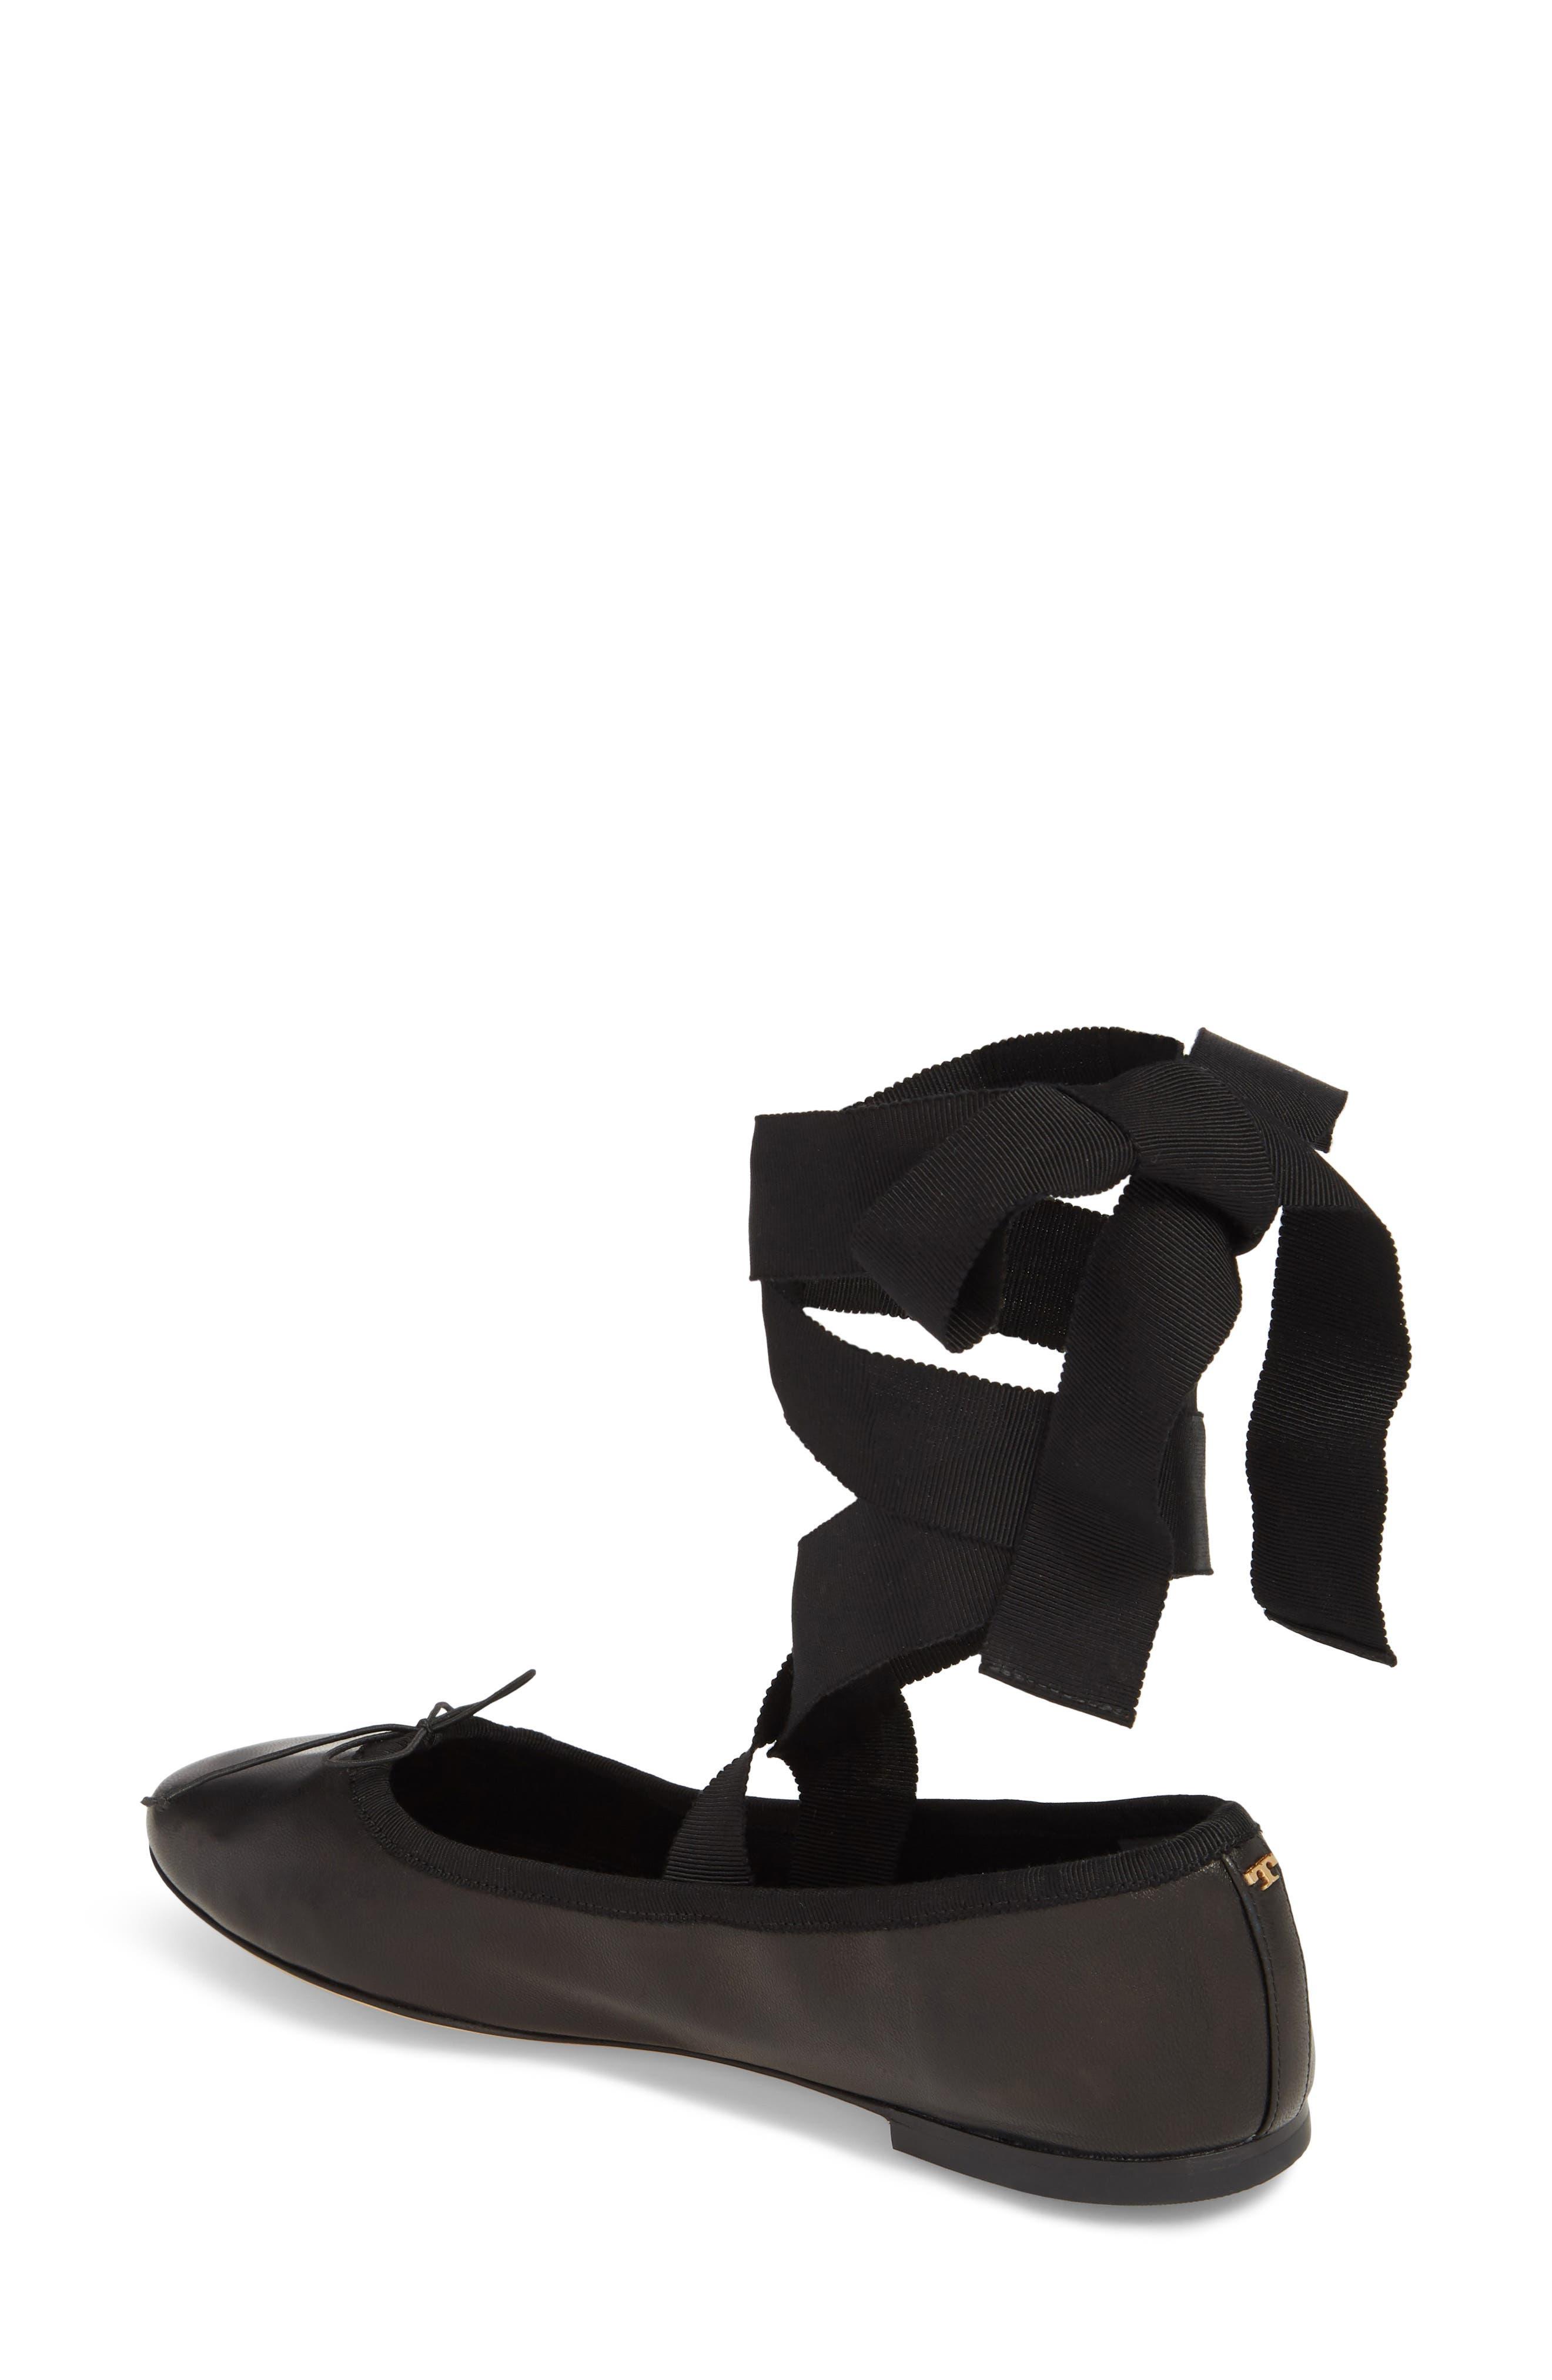 Elodie Lace-Up Ballet Flat,                             Alternate thumbnail 2, color,                             PERFECT BLACK